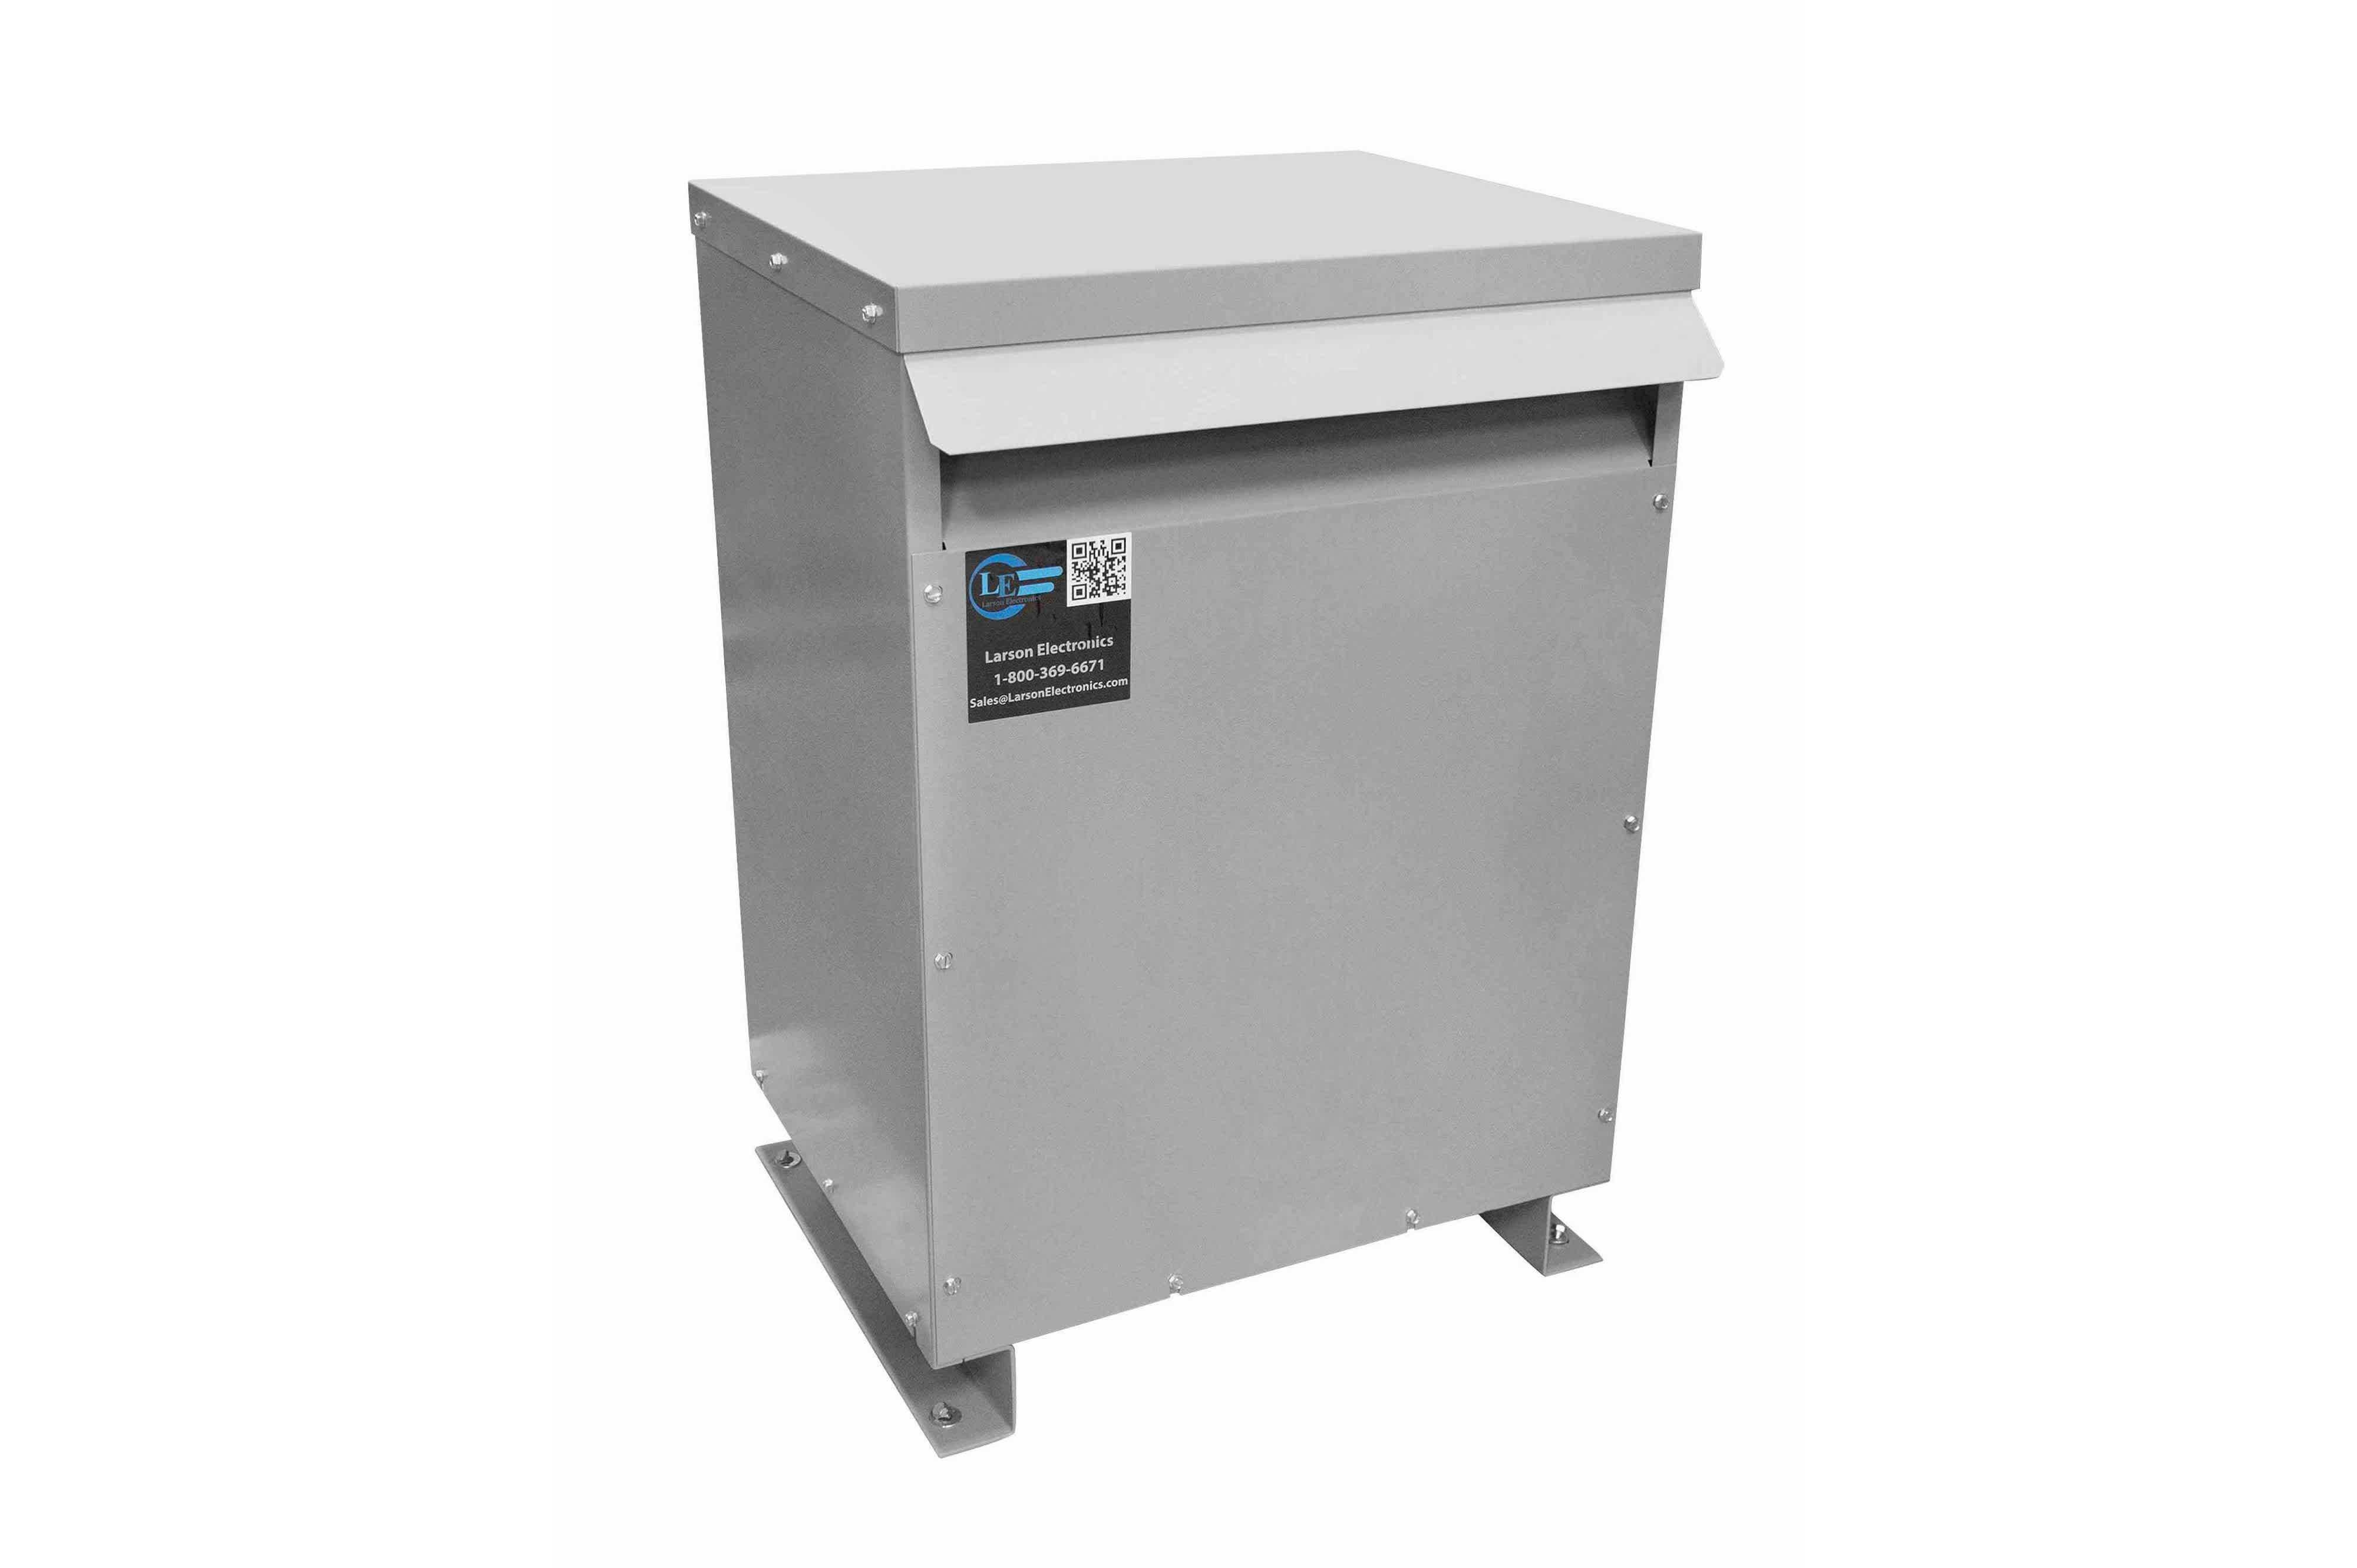 38 kVA 3PH Isolation Transformer, 575V Wye Primary, 240V Delta Secondary, N3R, Ventilated, 60 Hz